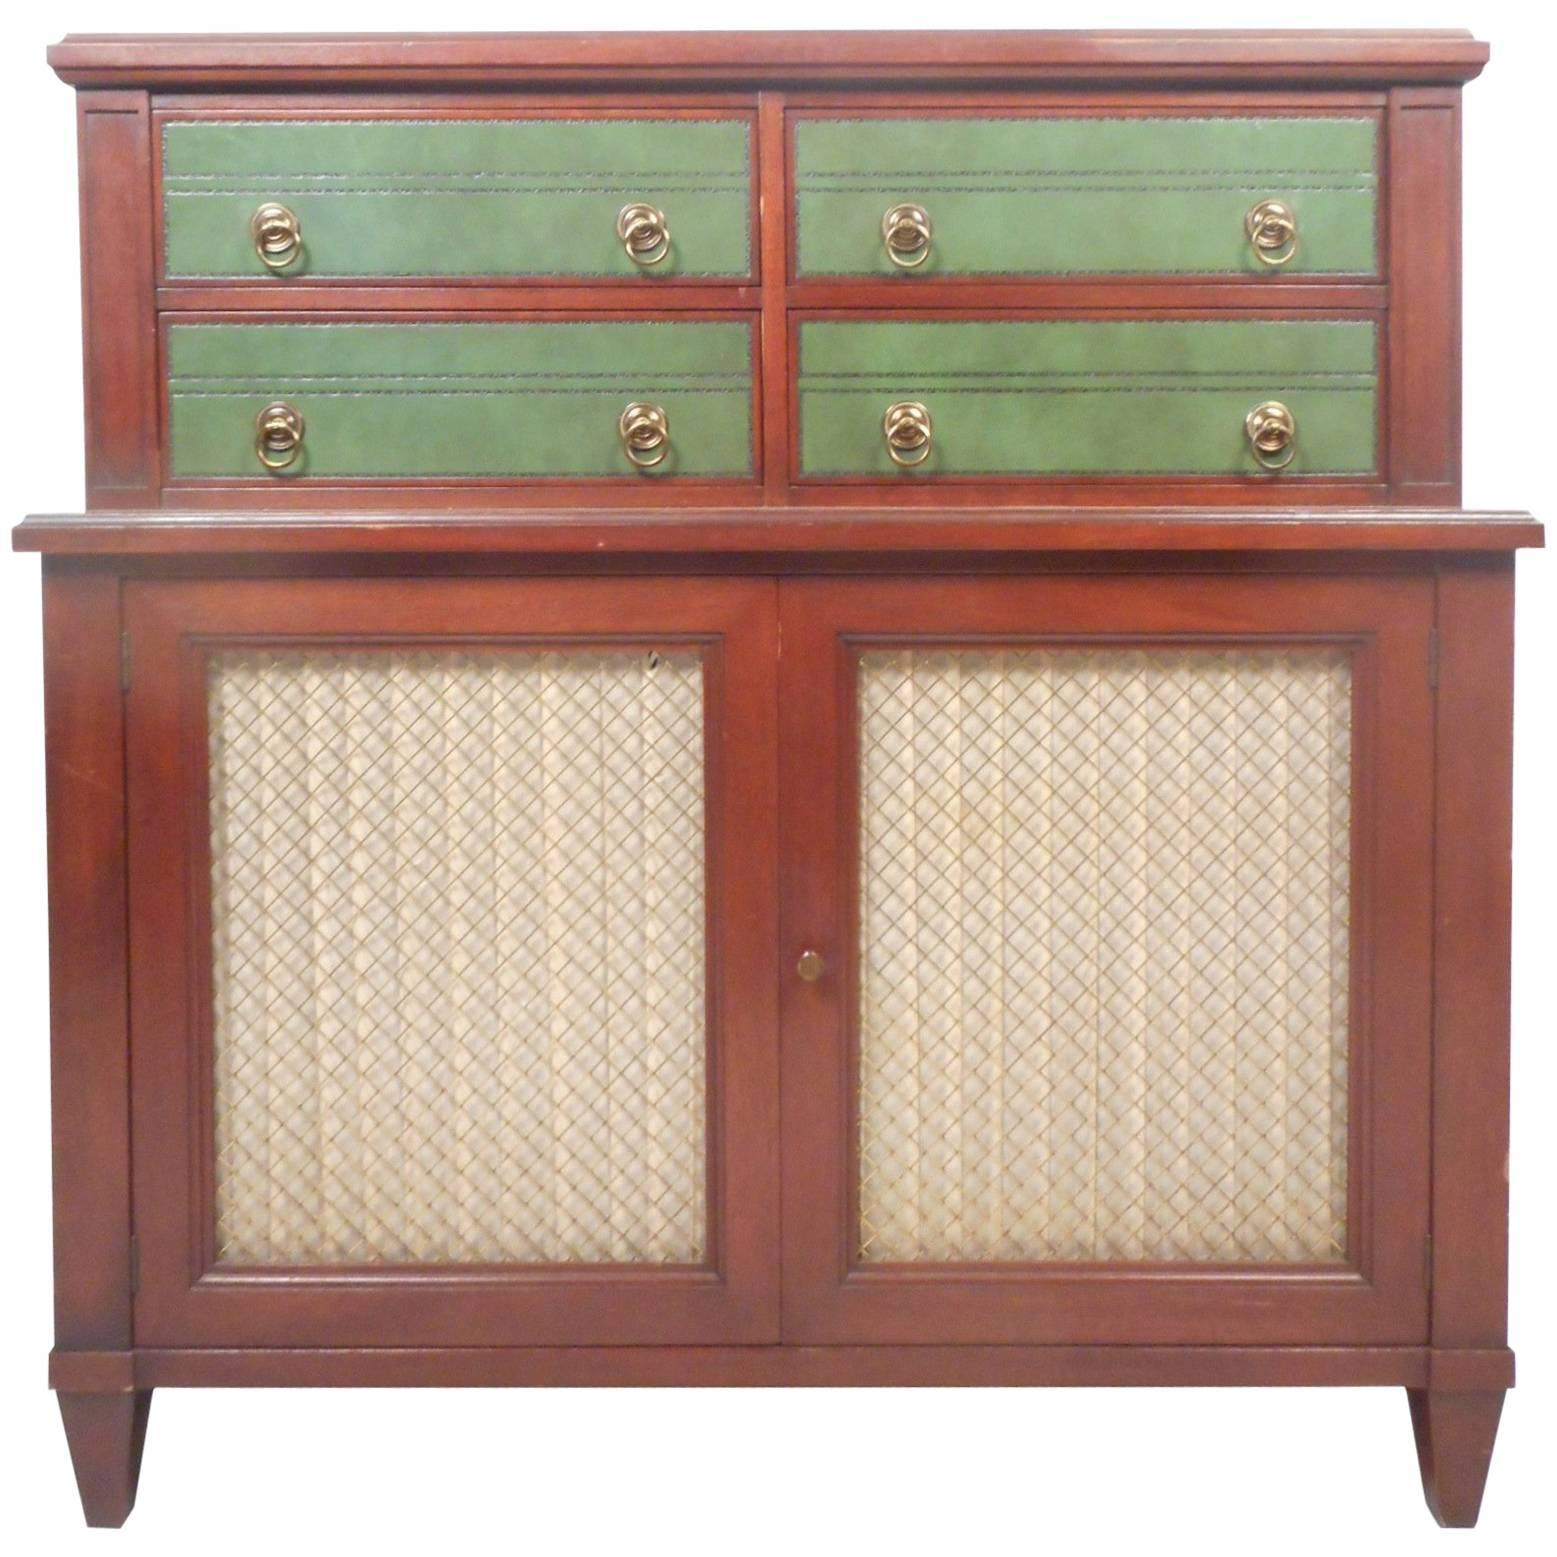 Vintage Renzo Rutili Green Leather and Mahogany Dresser for Johnson Furniture